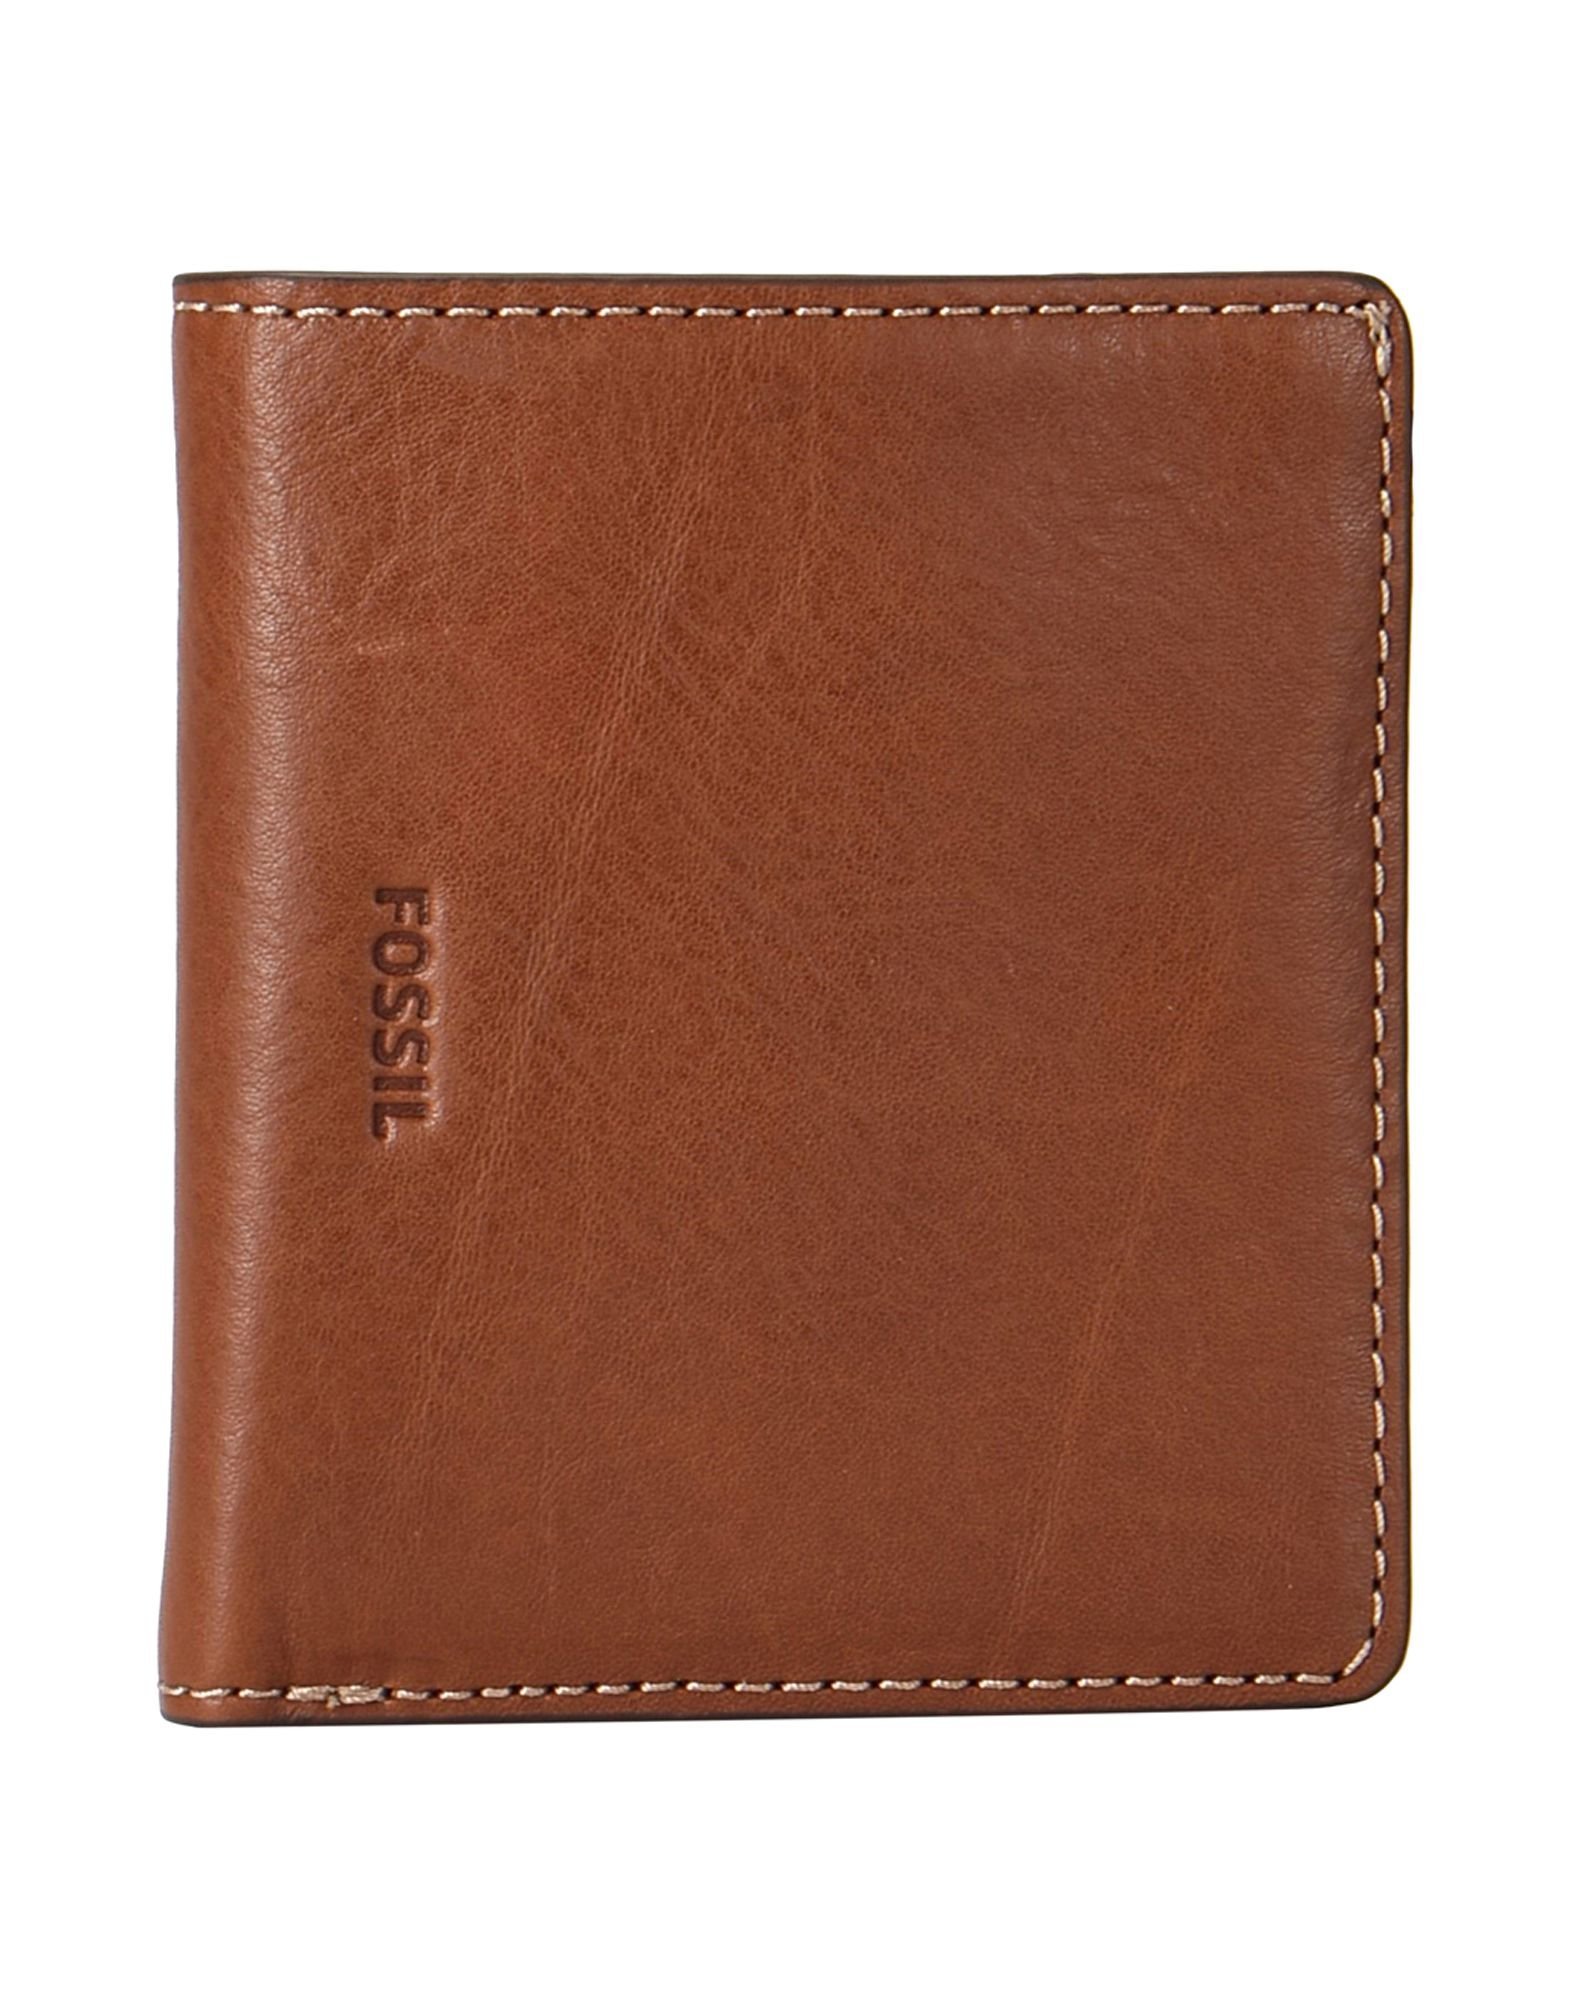 Fossil Wallets